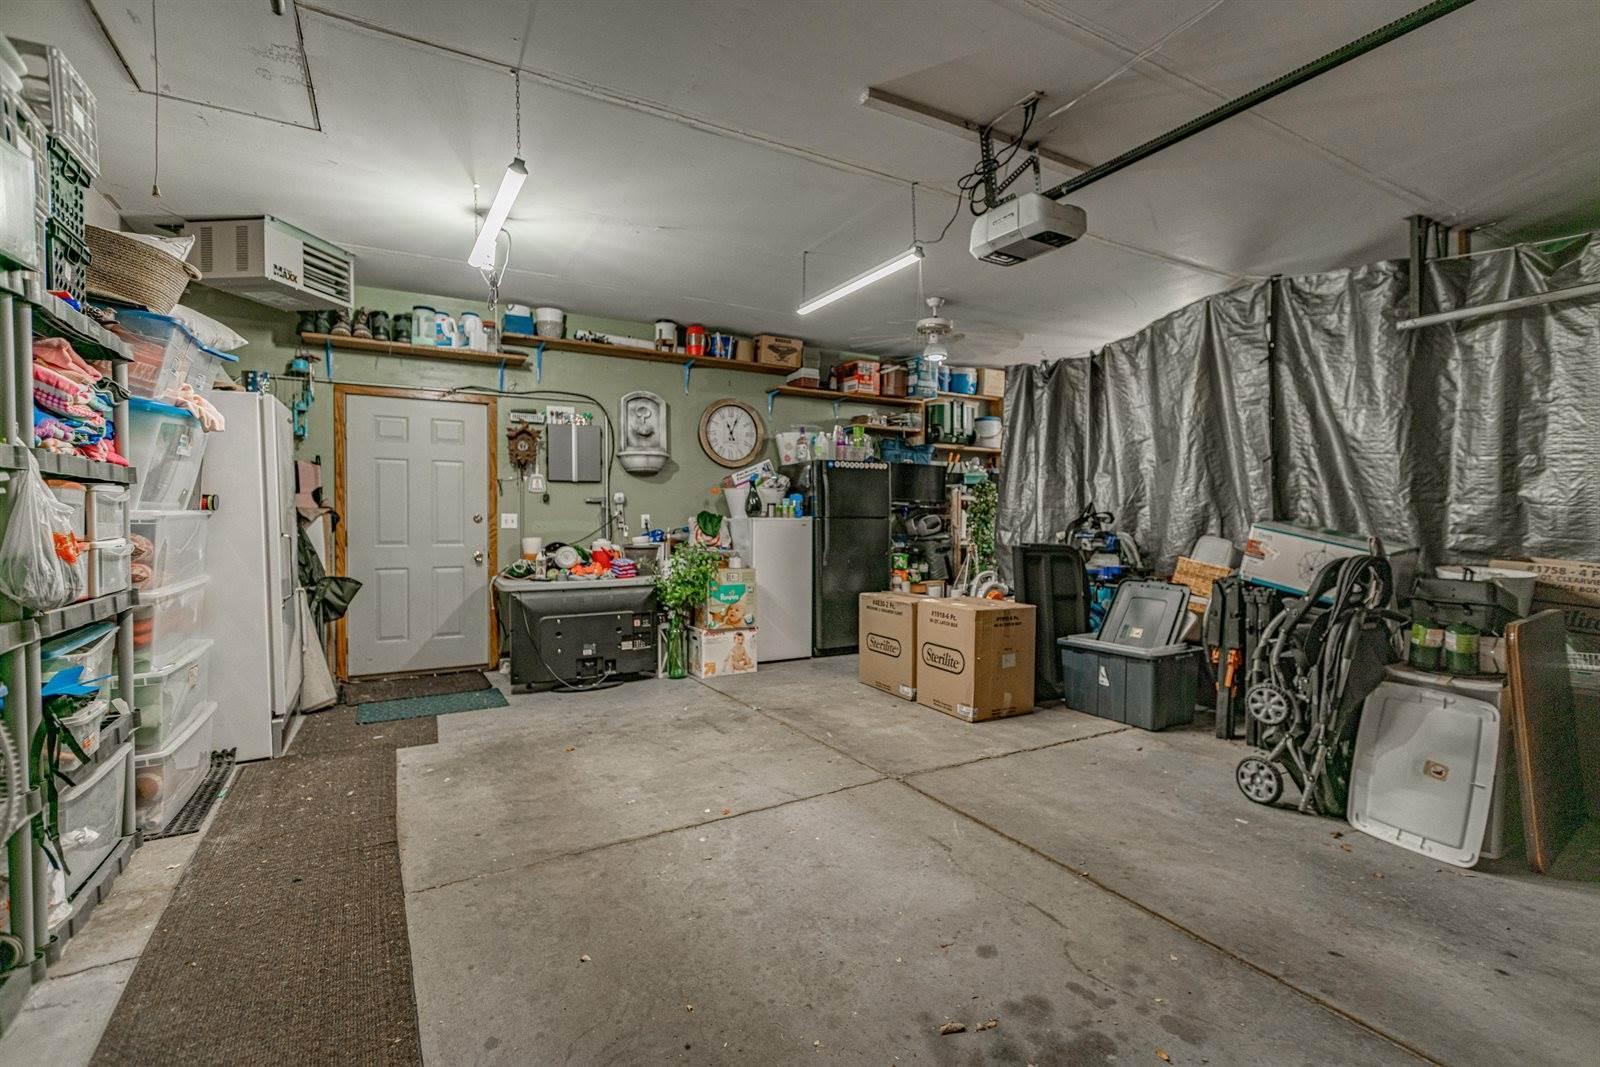 824 Turnpike Avenue, Bismarck, ND 58501